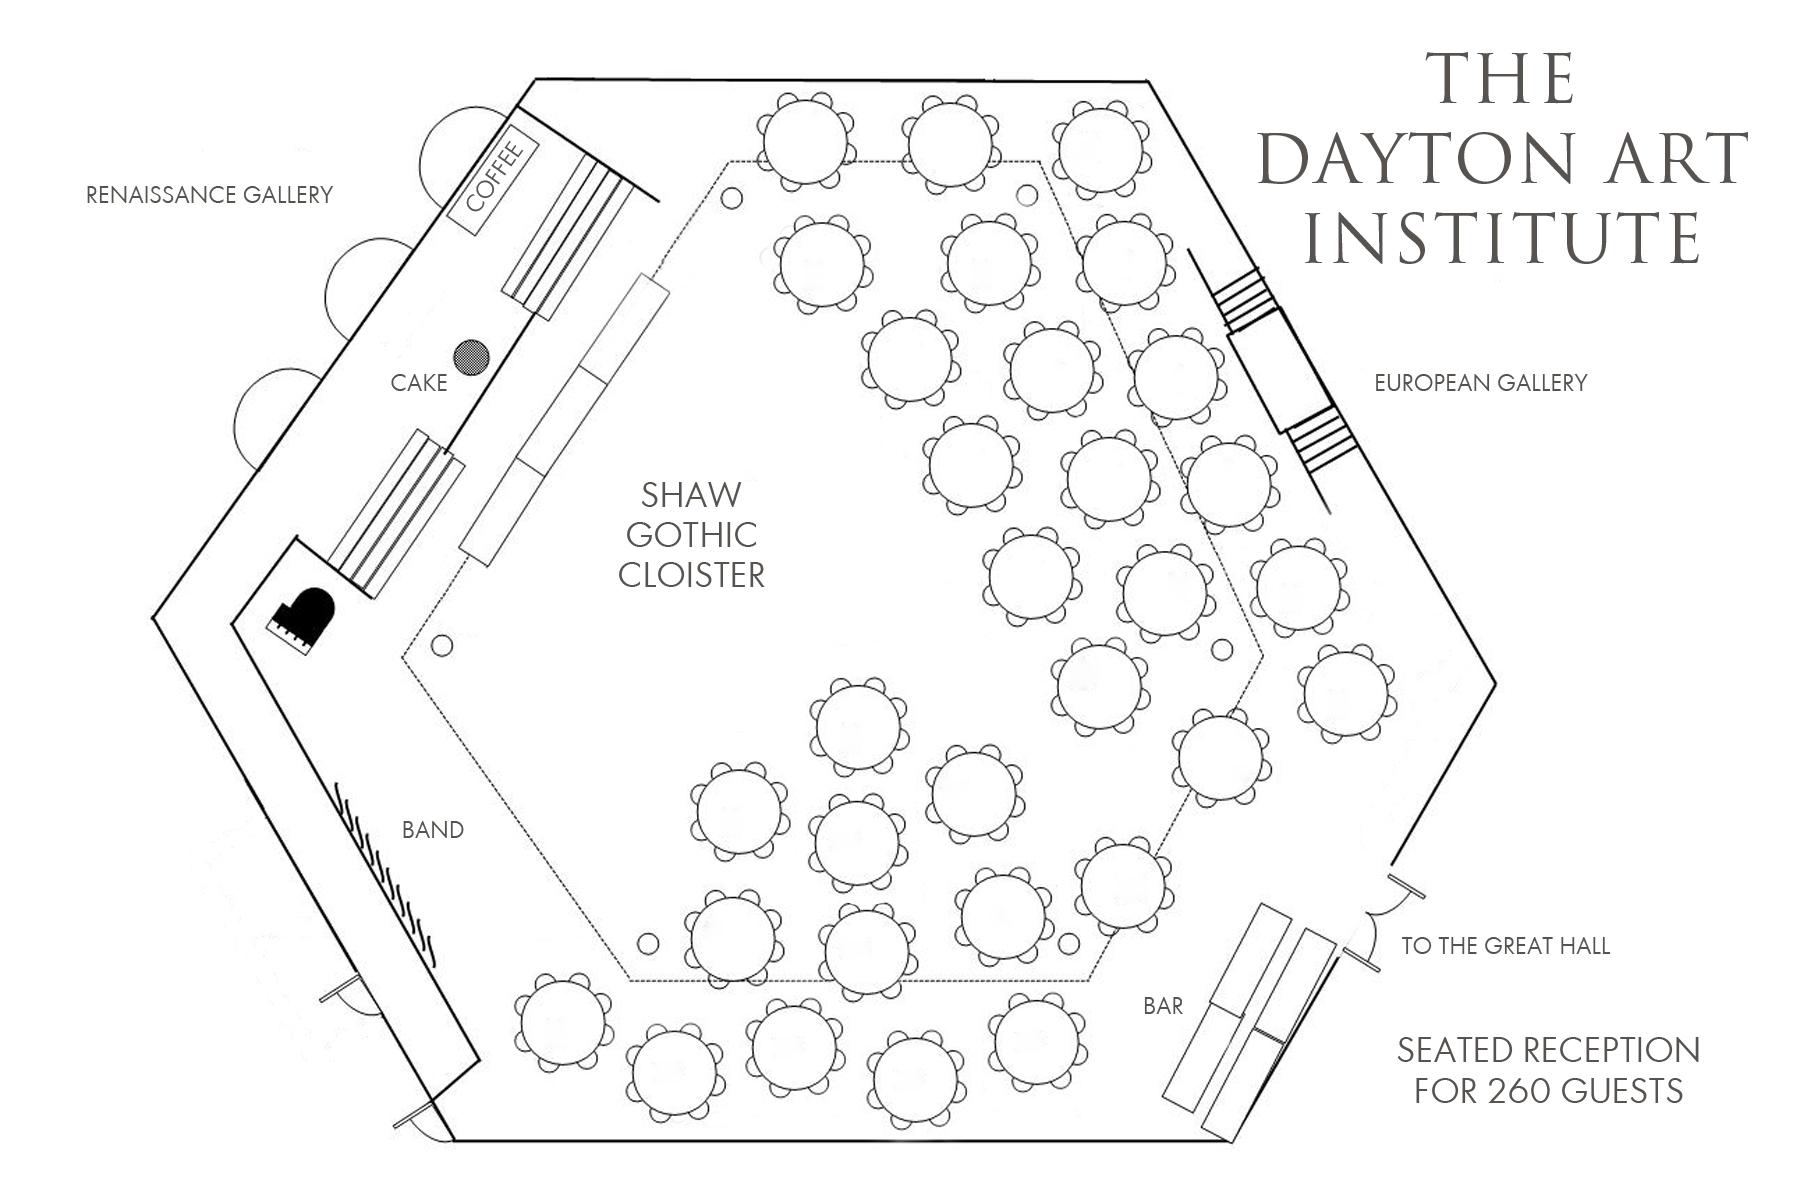 dayton-art-institute-wedding-venue-elite-catering-gothic-cloister-floor-plan.jpg